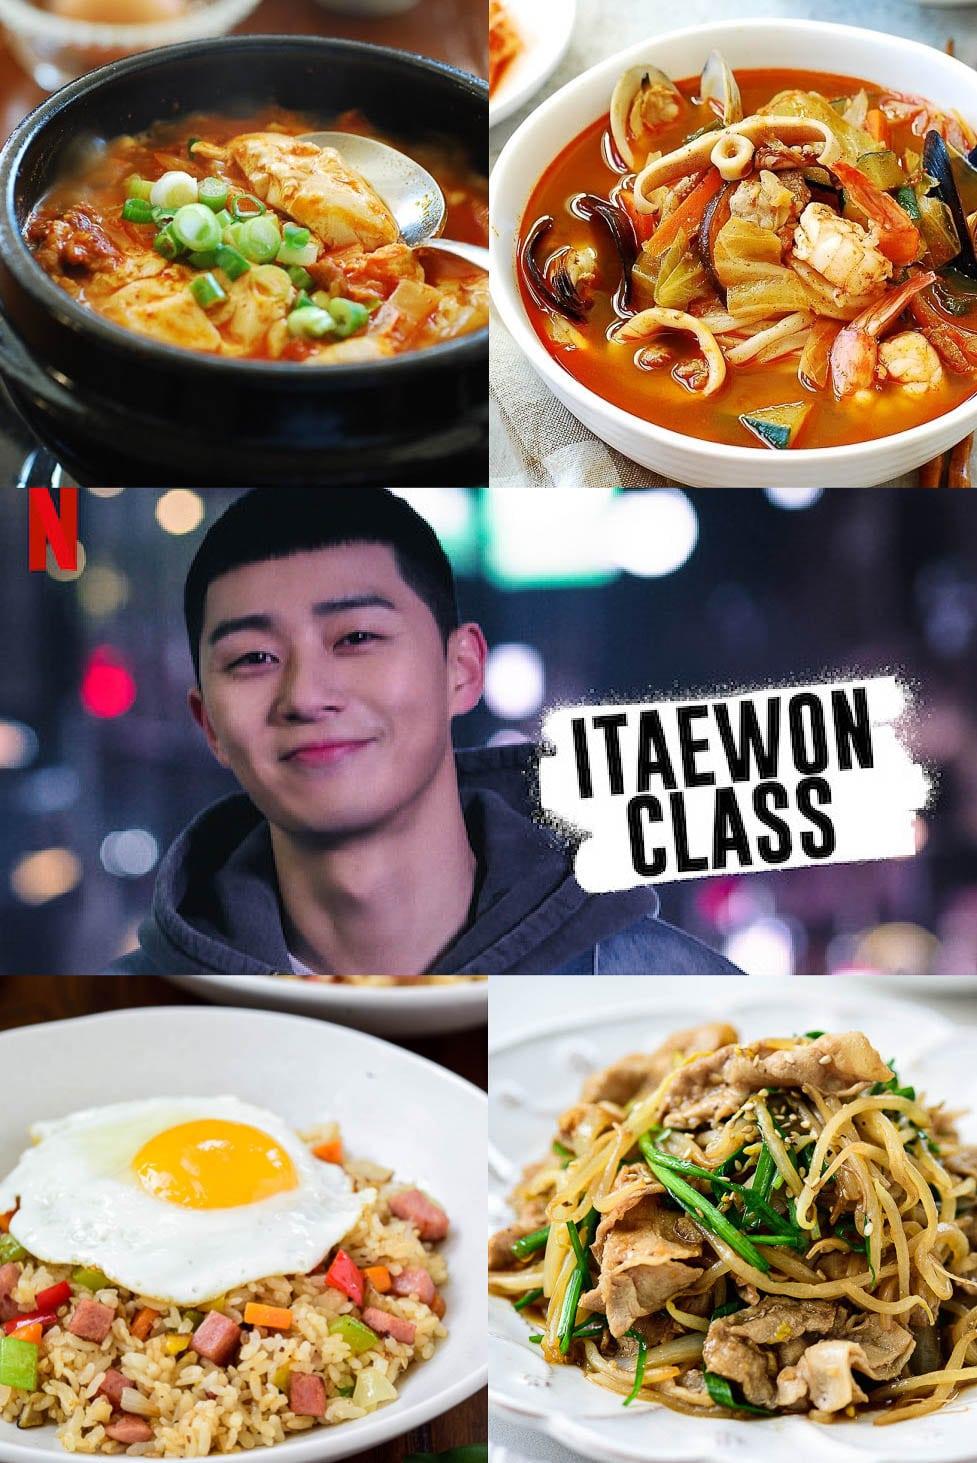 Blank 977 x 1463 9 - Korean Drama Food - Itaewon Class